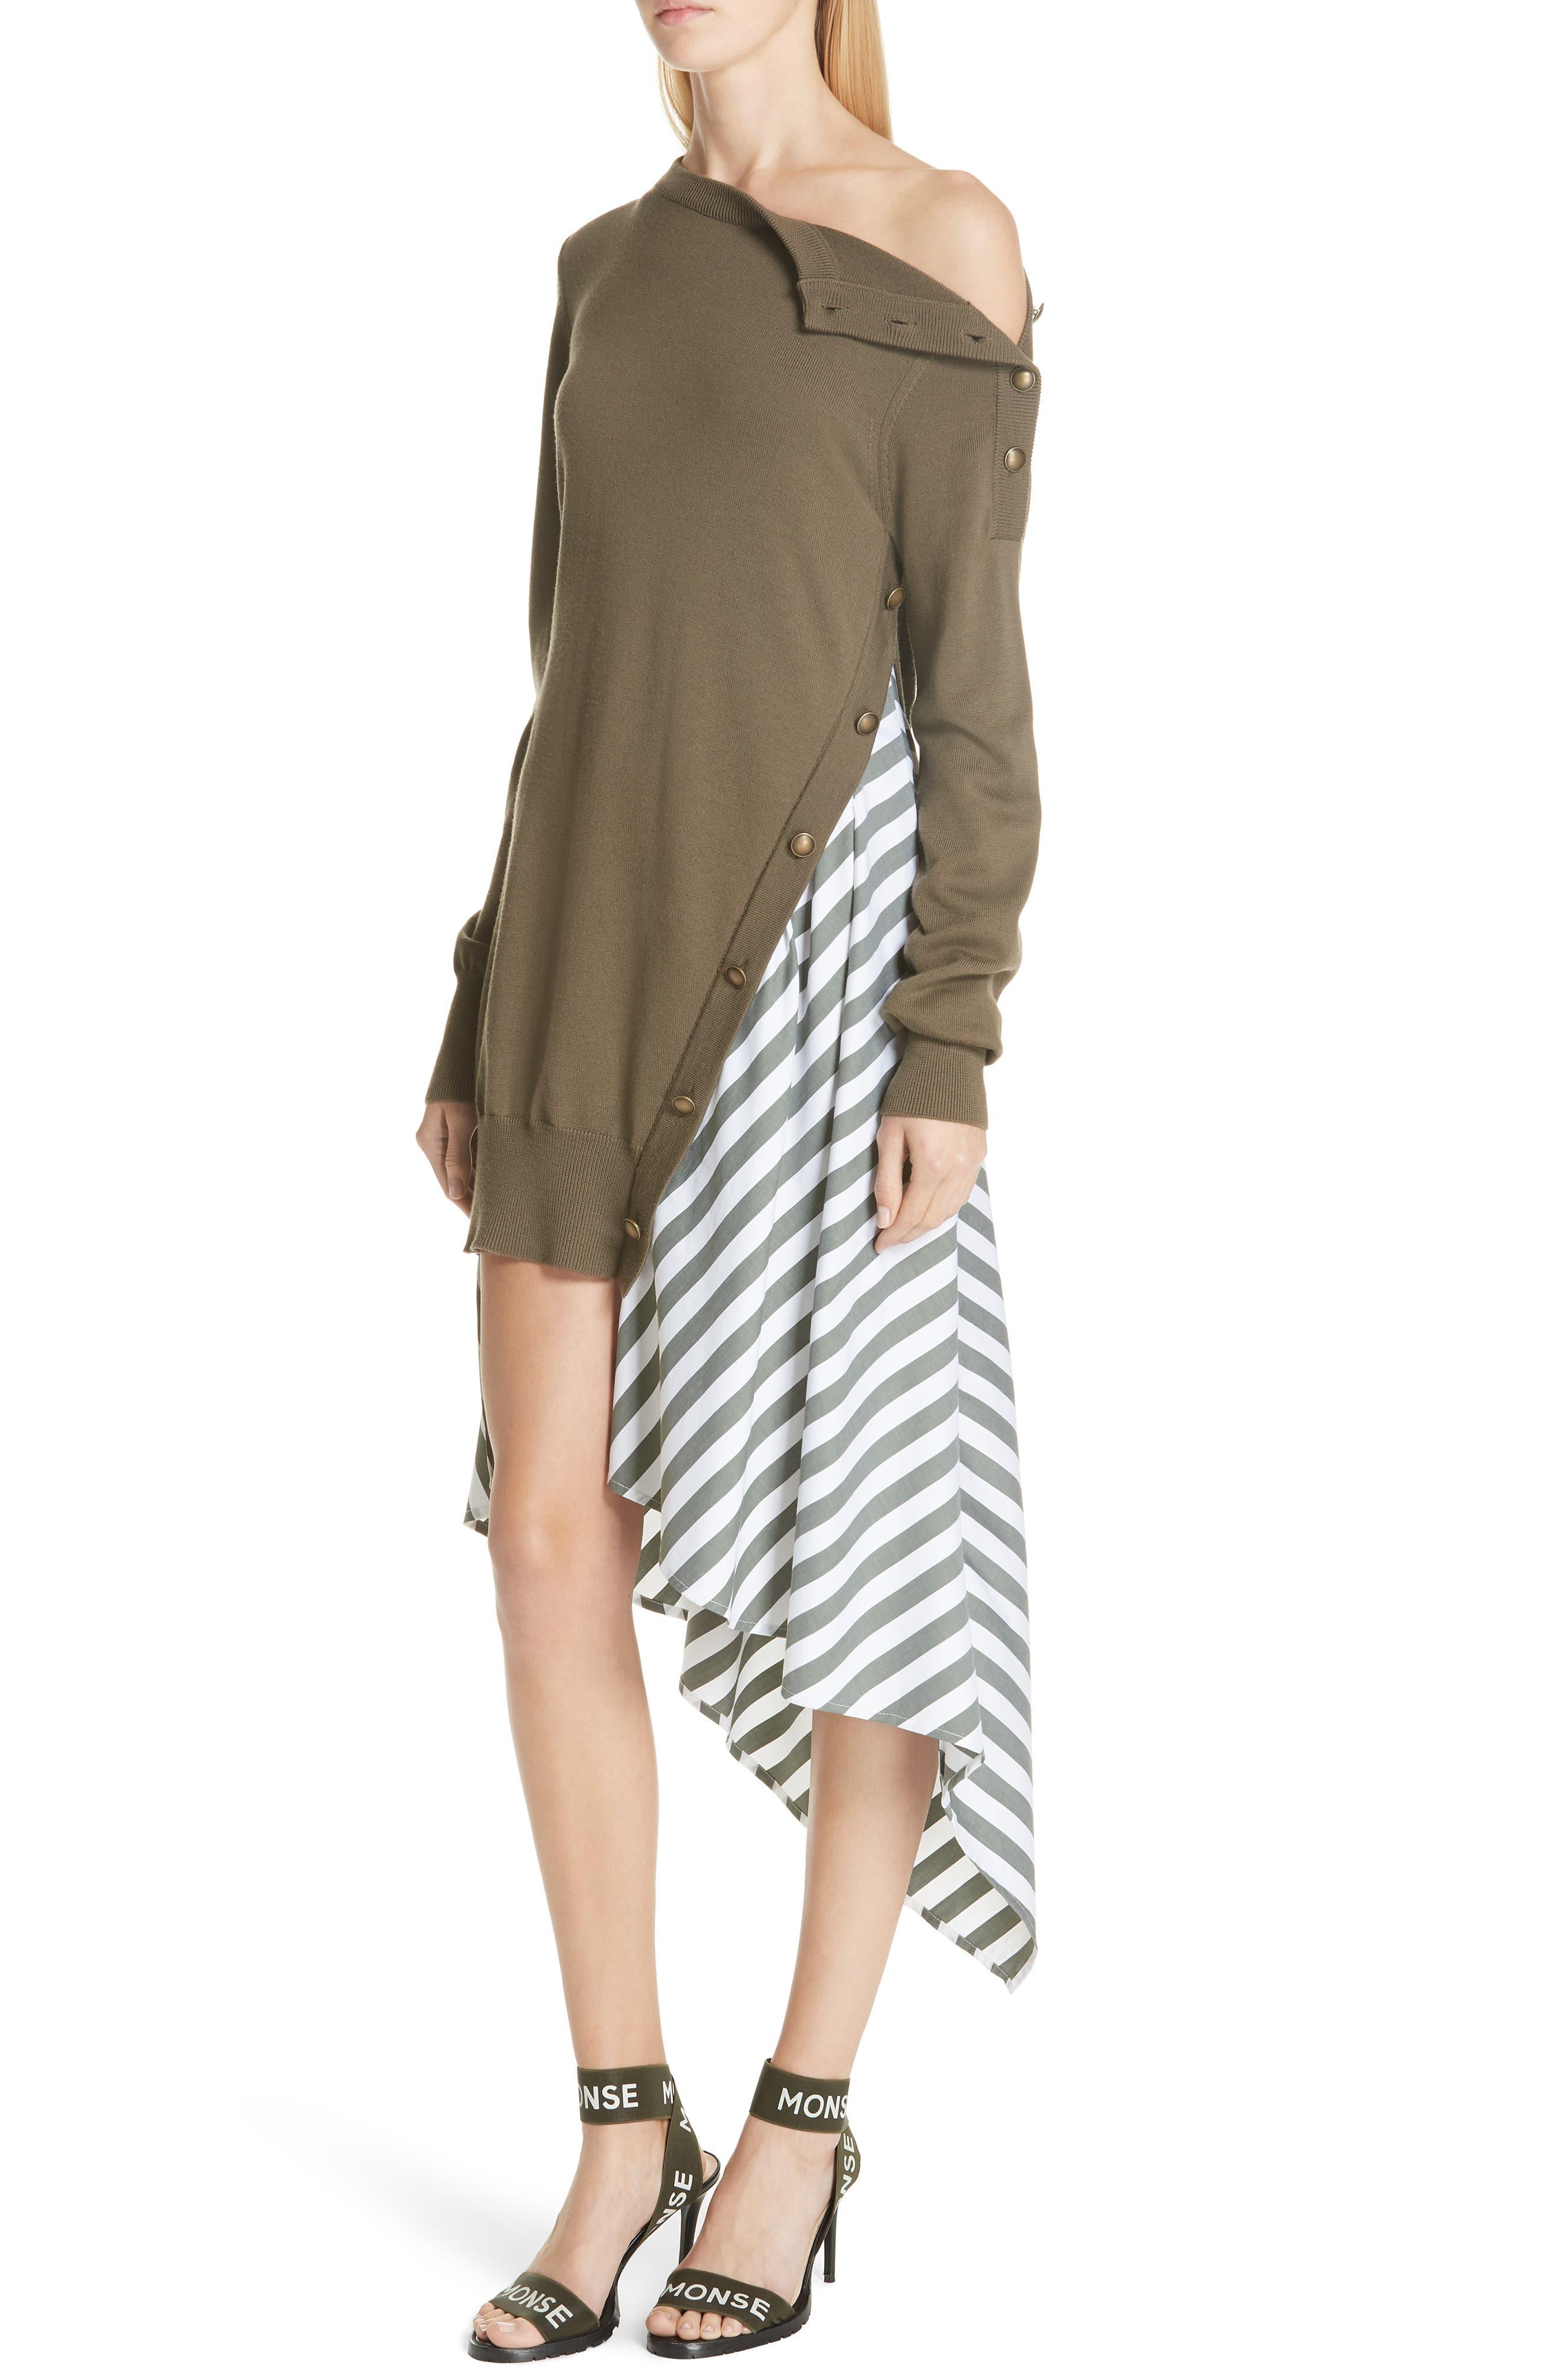 MONSE,                             Knit & Stripe Poplin Asymmetrical Dress,                             Alternate thumbnail 4, color,                             OLIVE/ WHITE